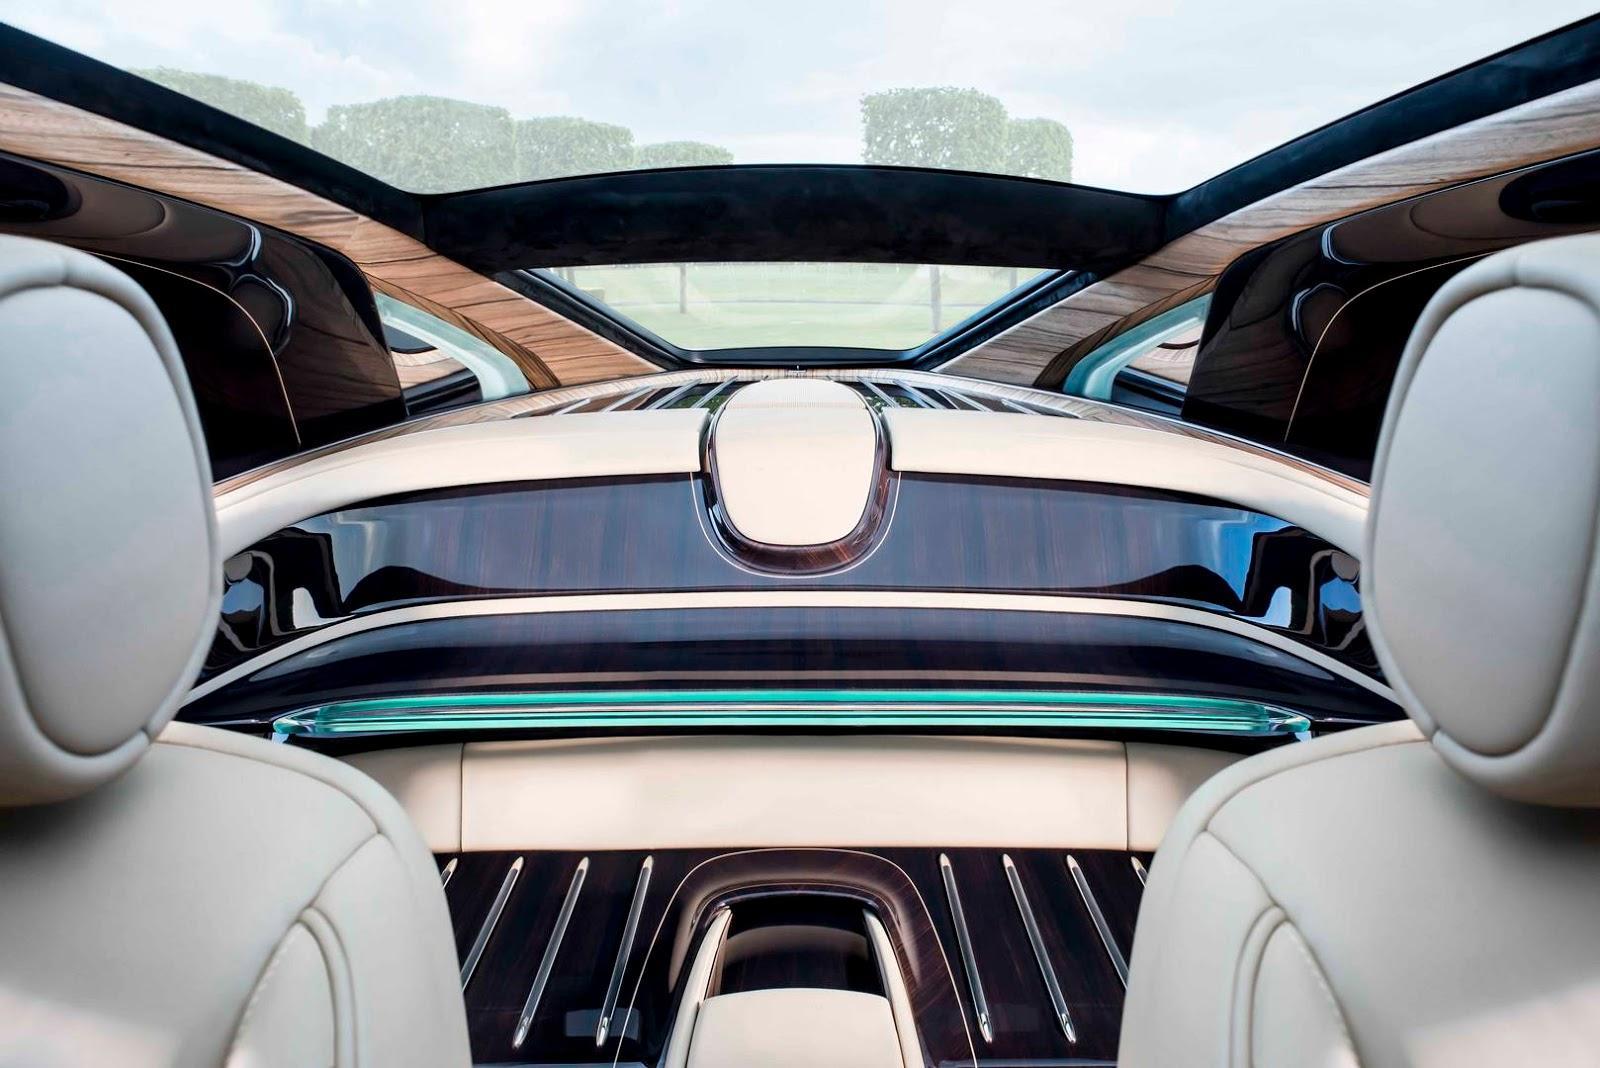 Rolls-Royce Phantom Star of India si Sweptail - Rolls-Royce Phantom Star of India si Sweptail